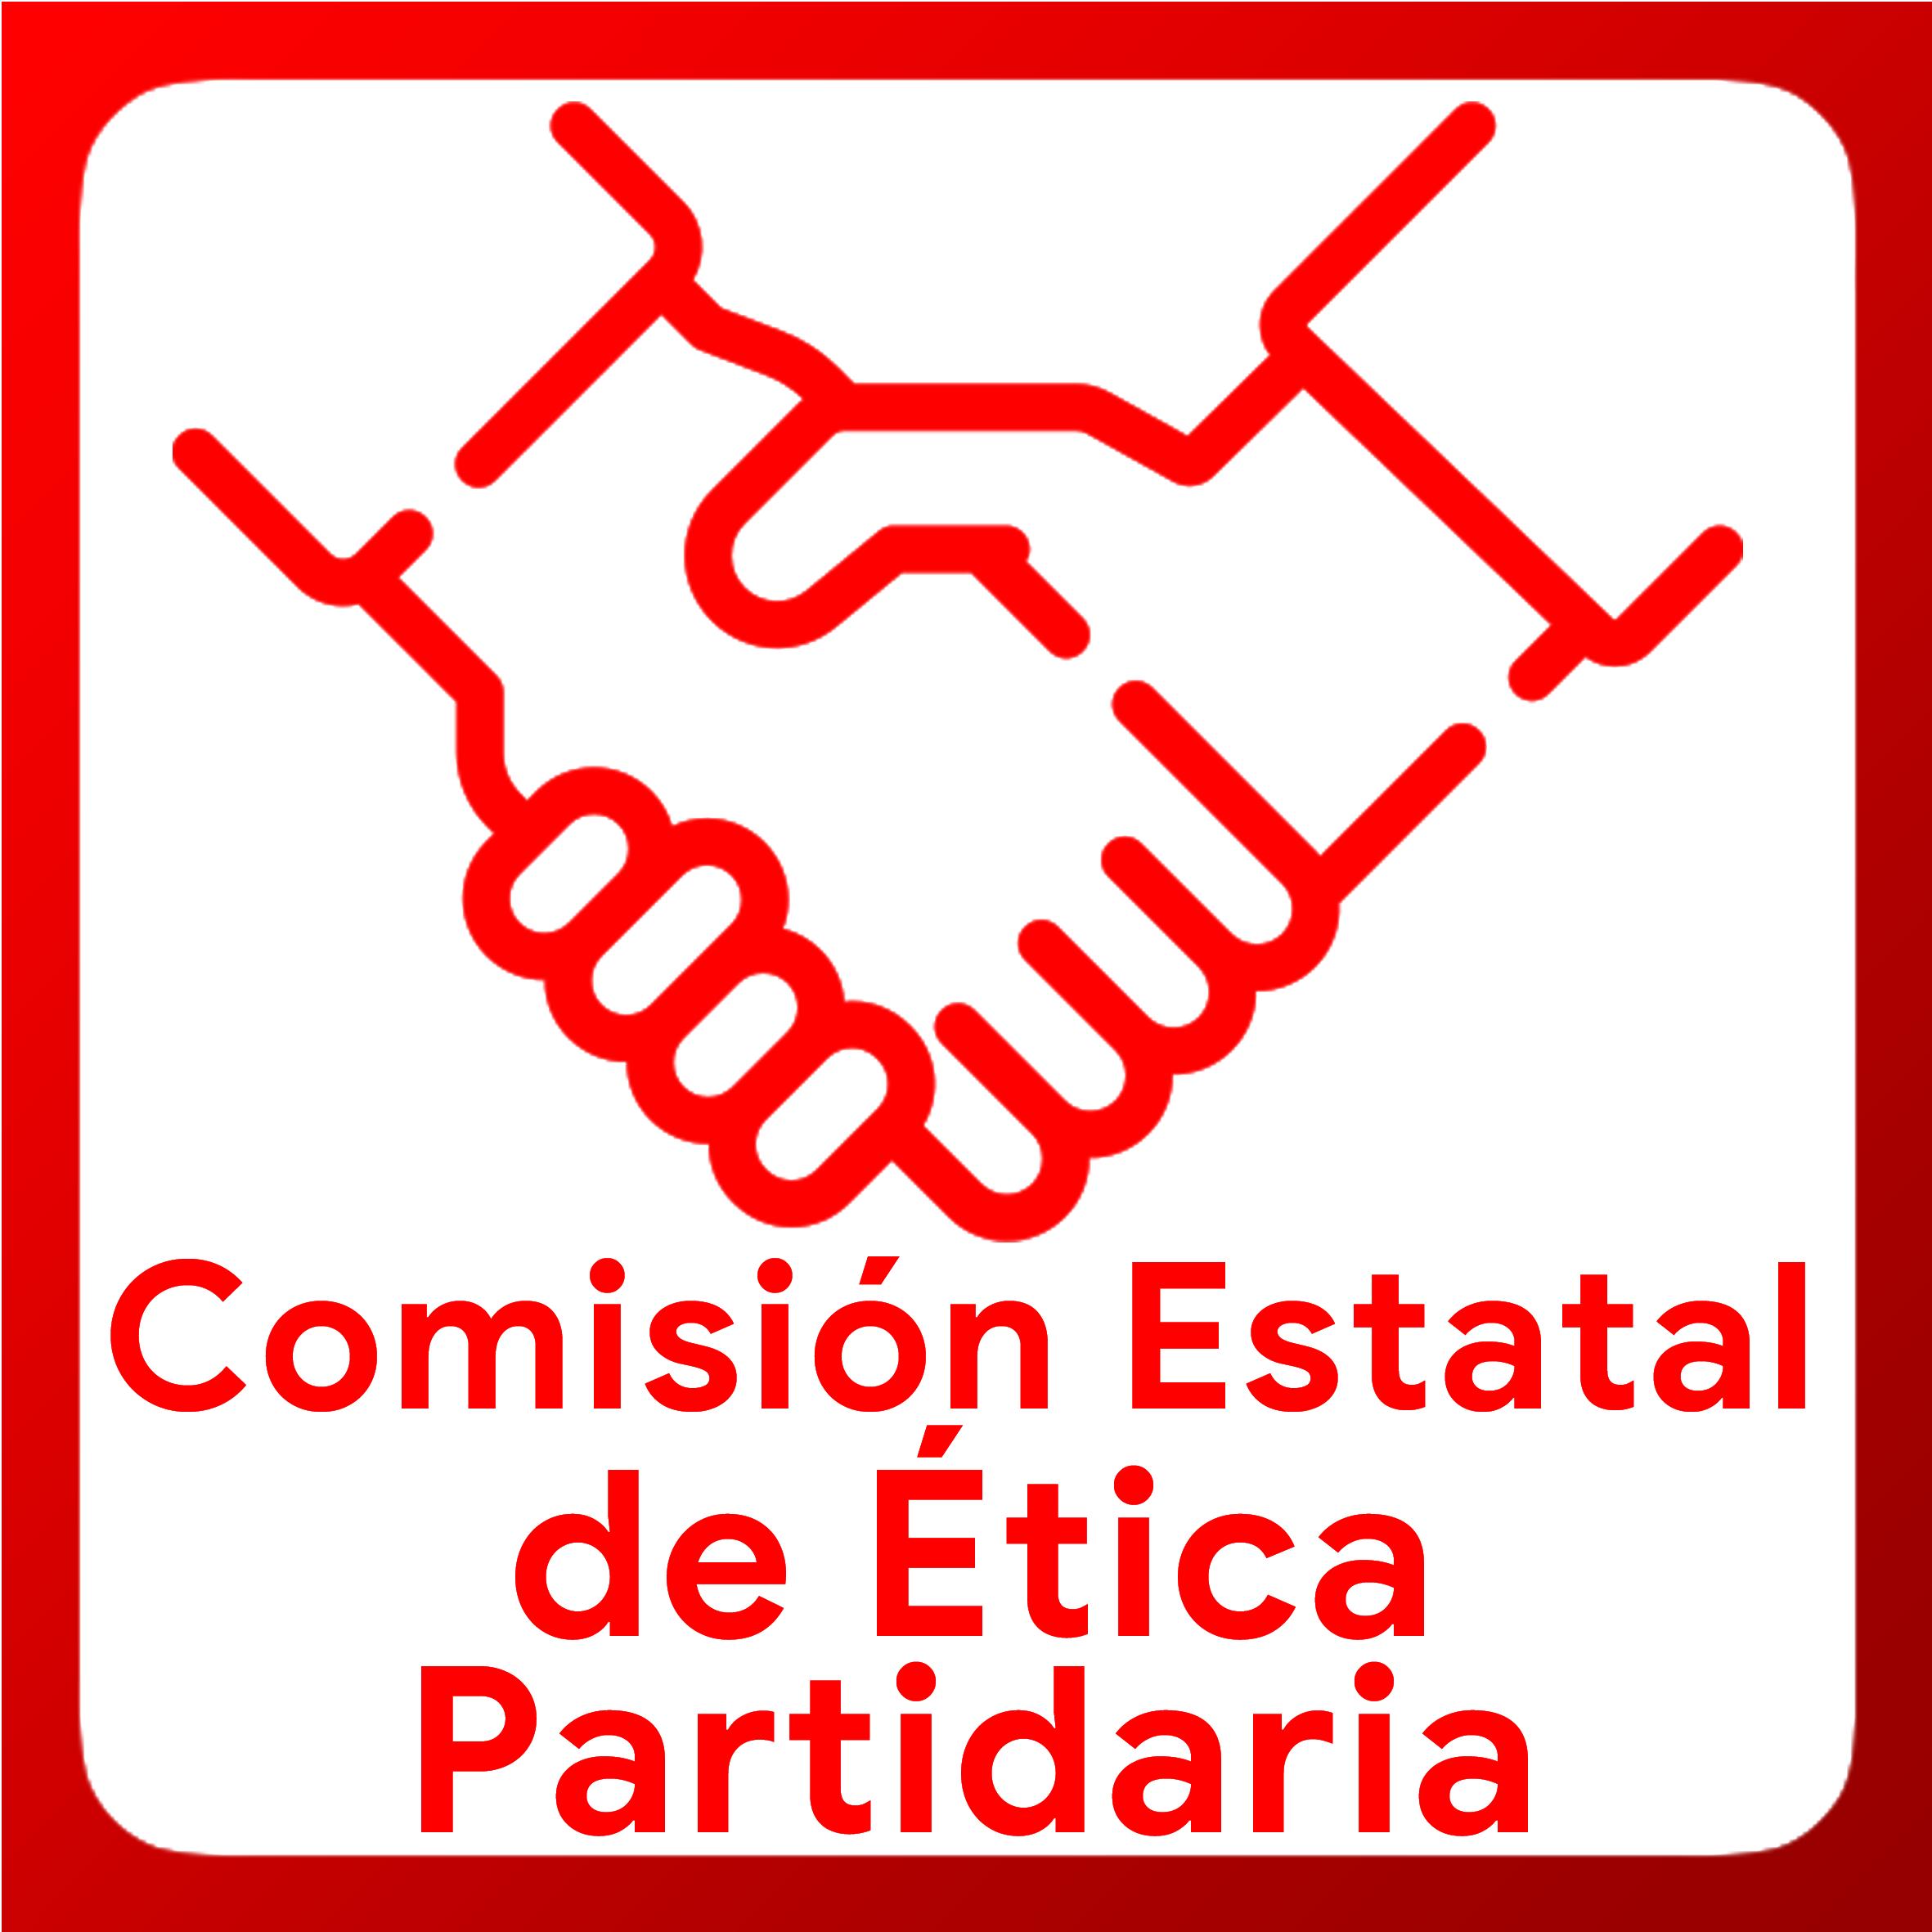 Boton activable de Comision Estatal de Ética Partidaria